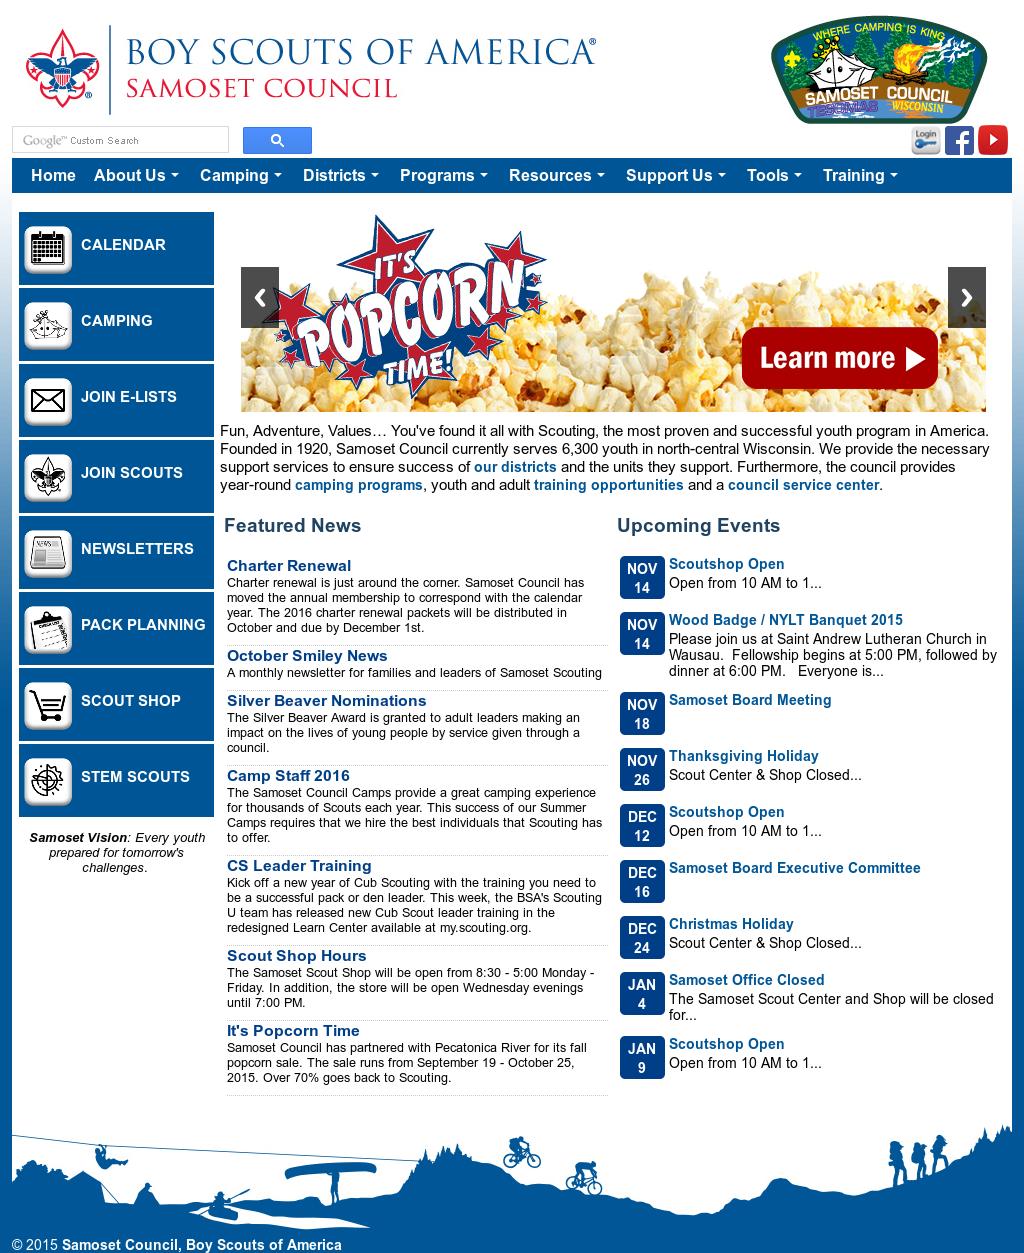 Boy Scouts Of America - Samoset Council Competitors, Revenue